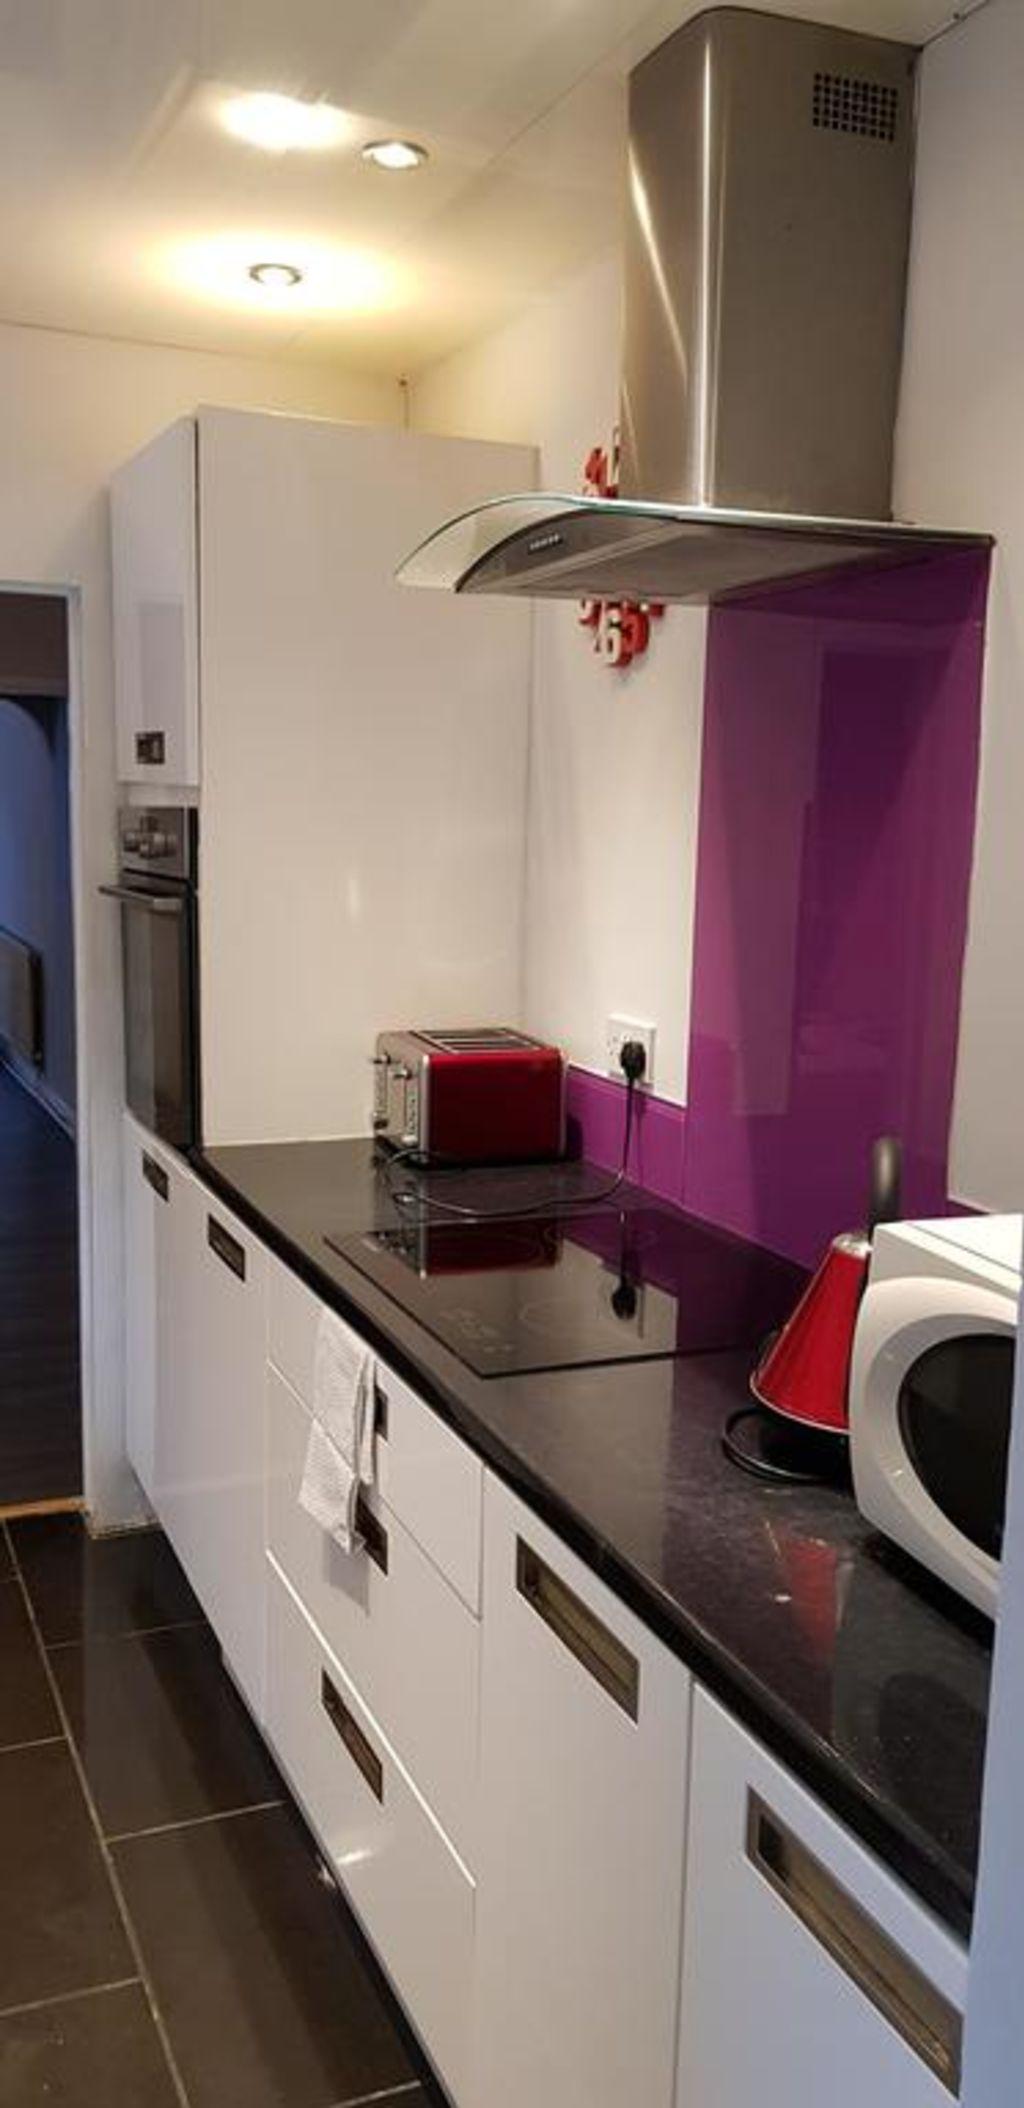 image 4 furnished 3 bedroom Apartment for rent in Gedling, Nottinghamshire